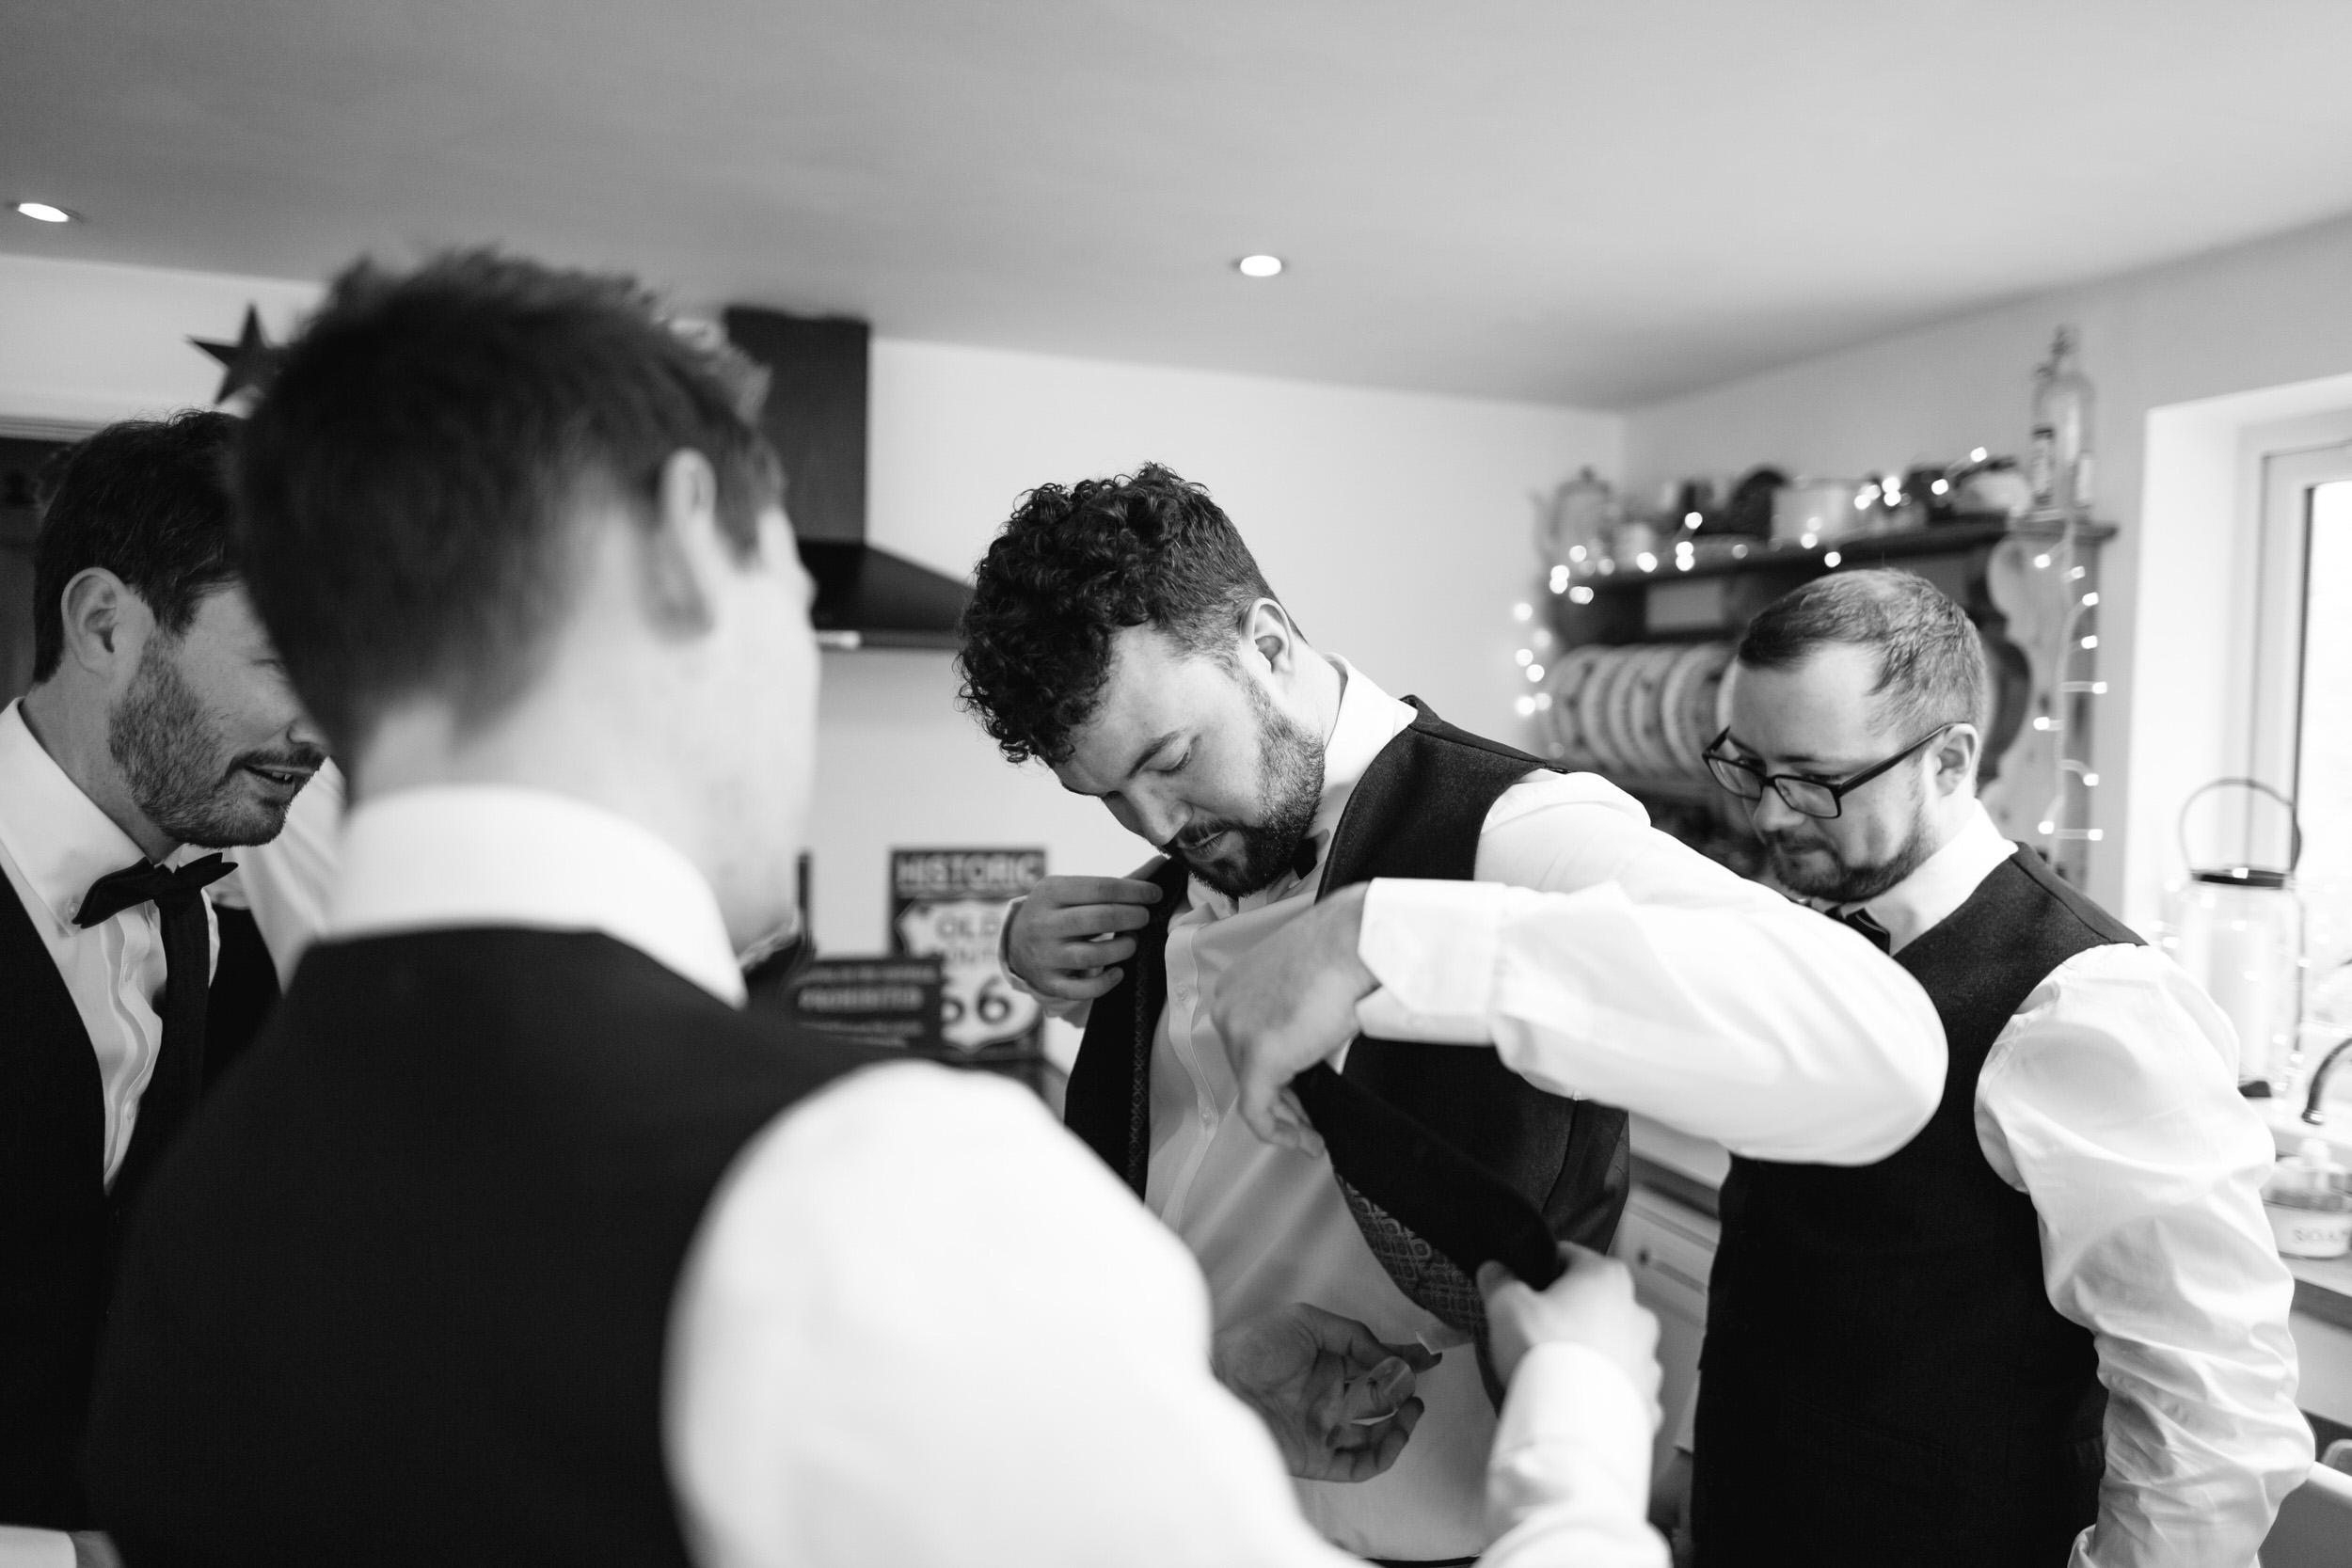 Launcells-Barton-Wedding-Photographer (19).jpg